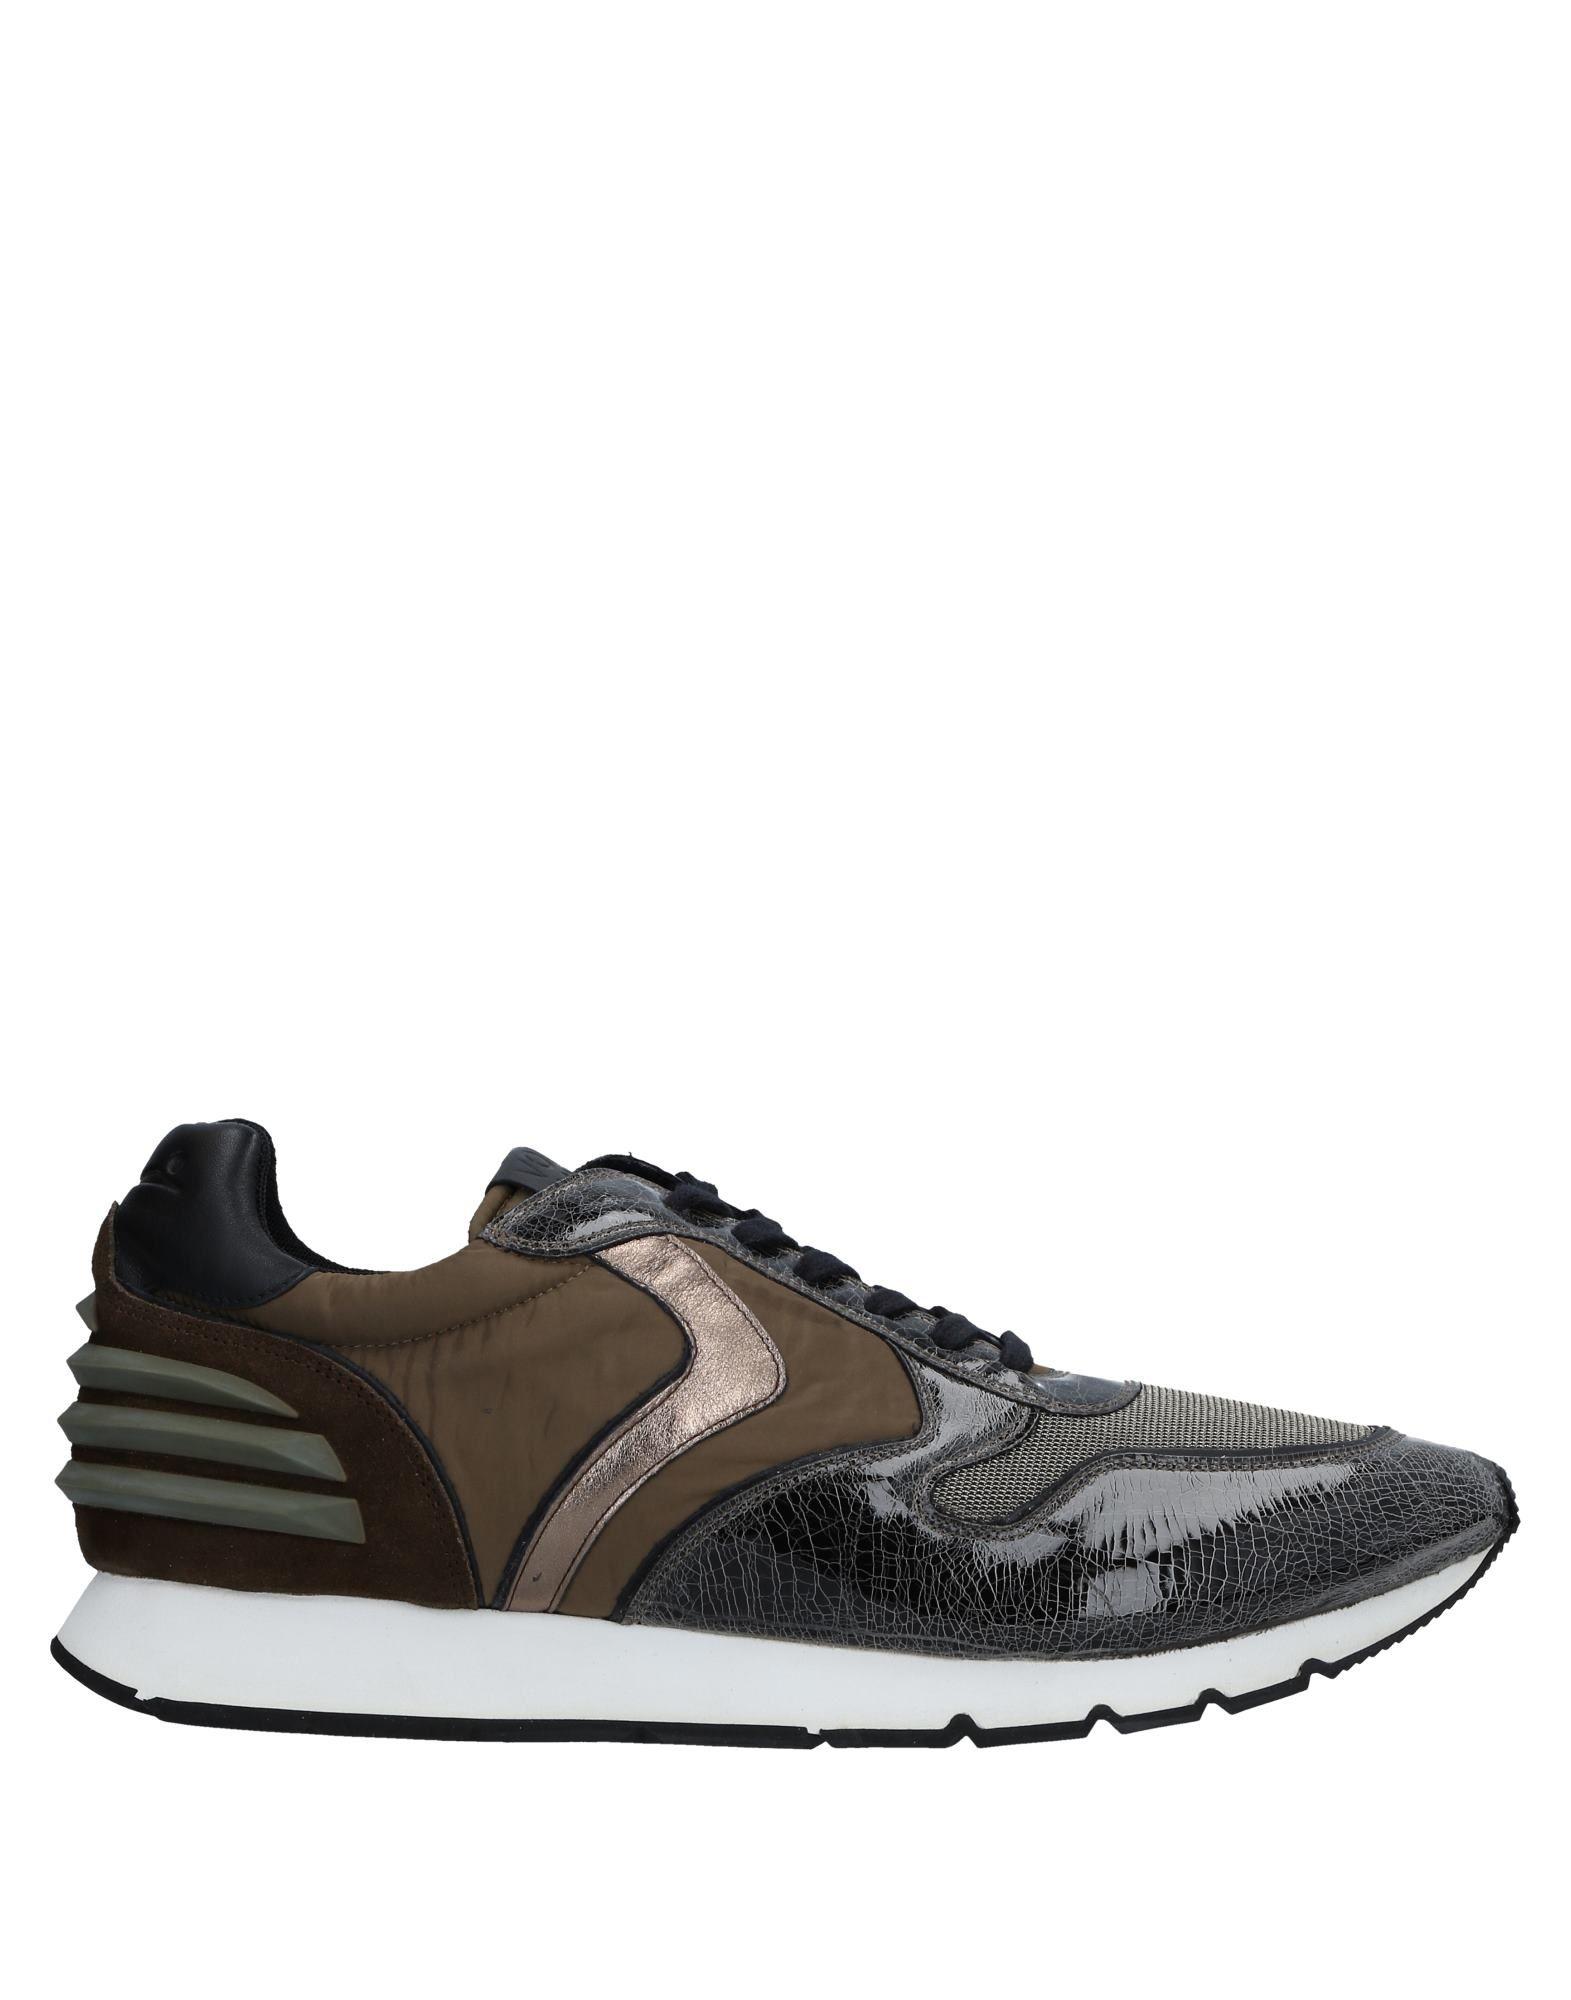 Sneakers Voile Blanche Uomo - 11534613OB